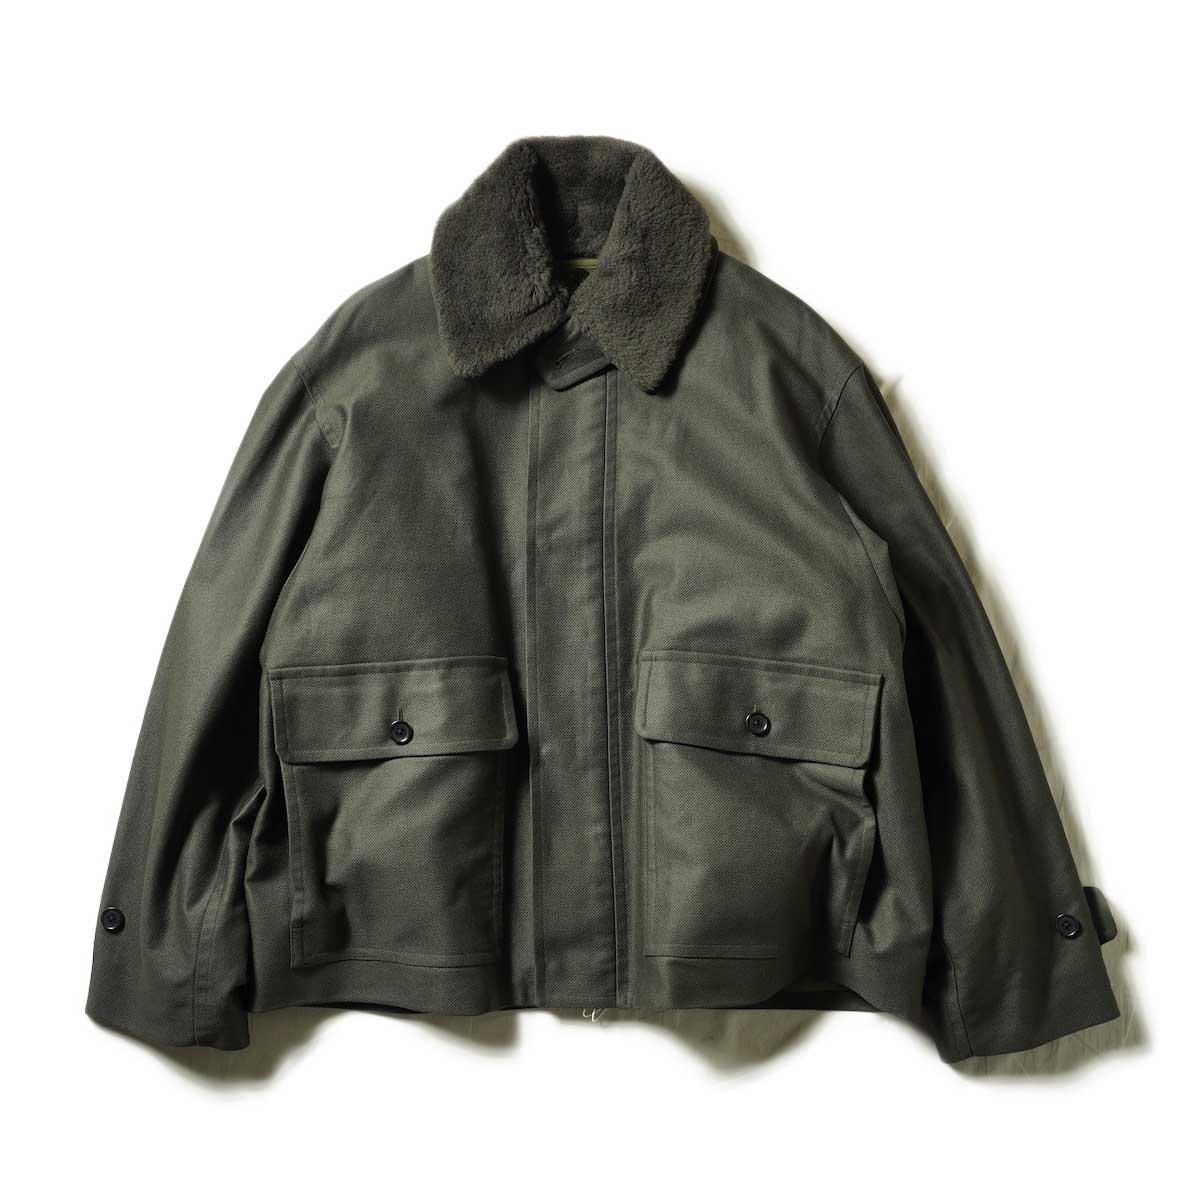 blurhms / Bloken Cloth A2MK3 Jacket (Khaki Gray)